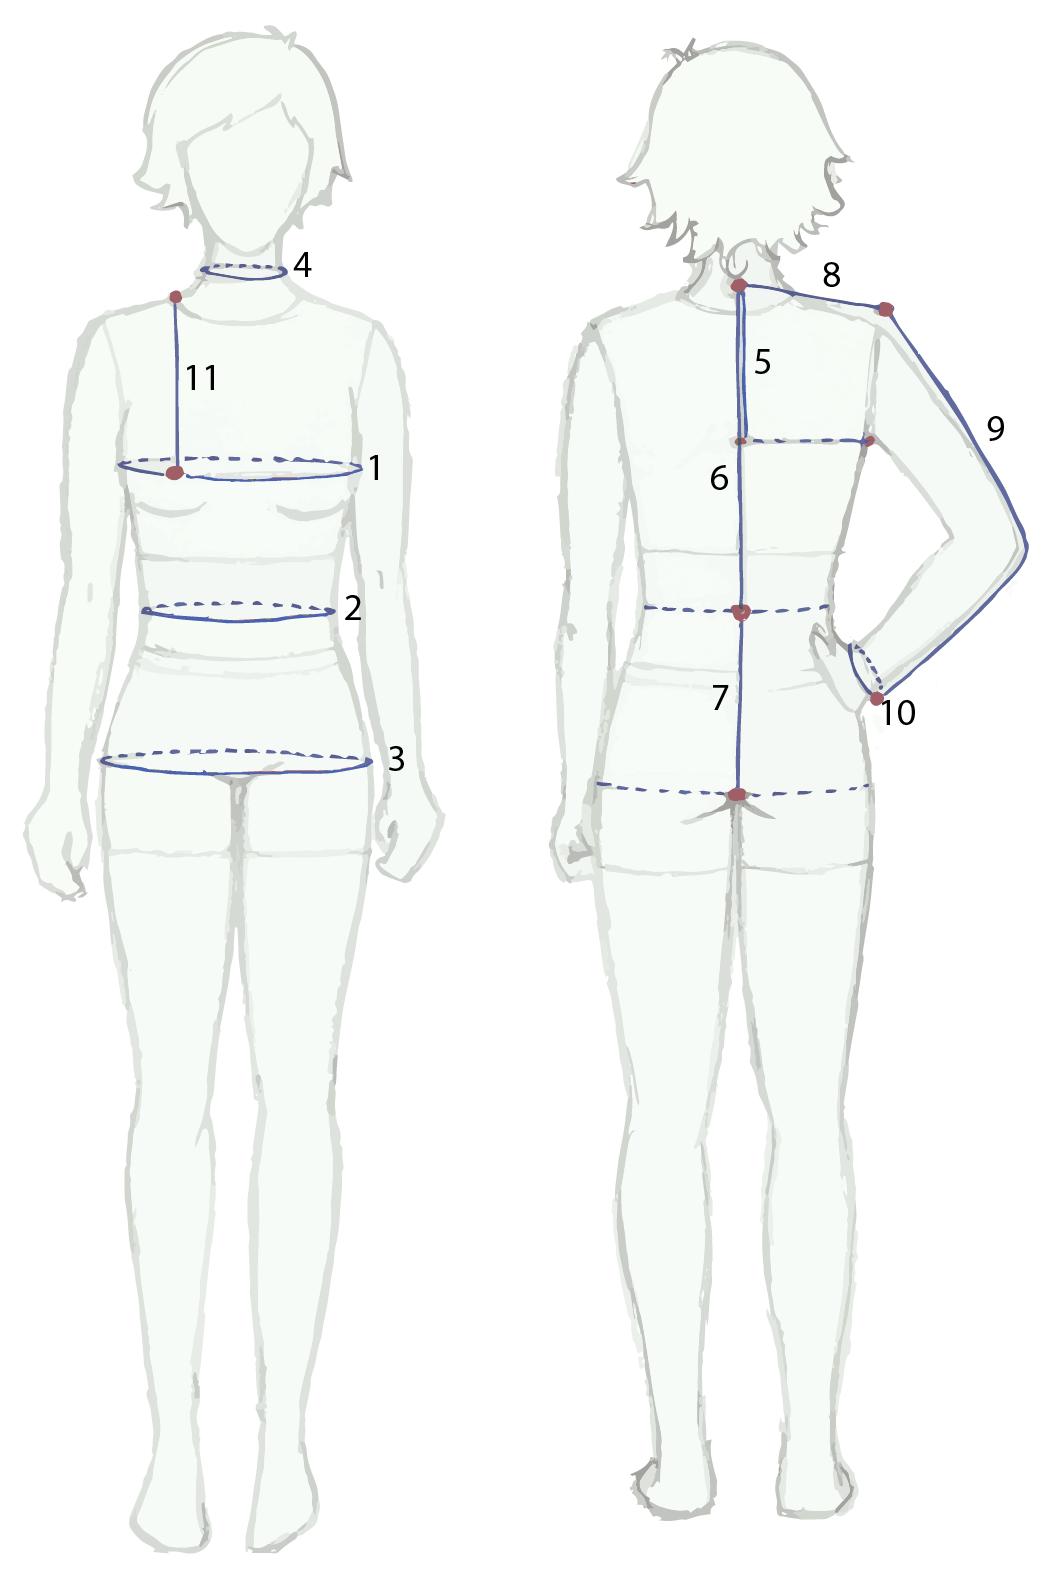 mål til tøj